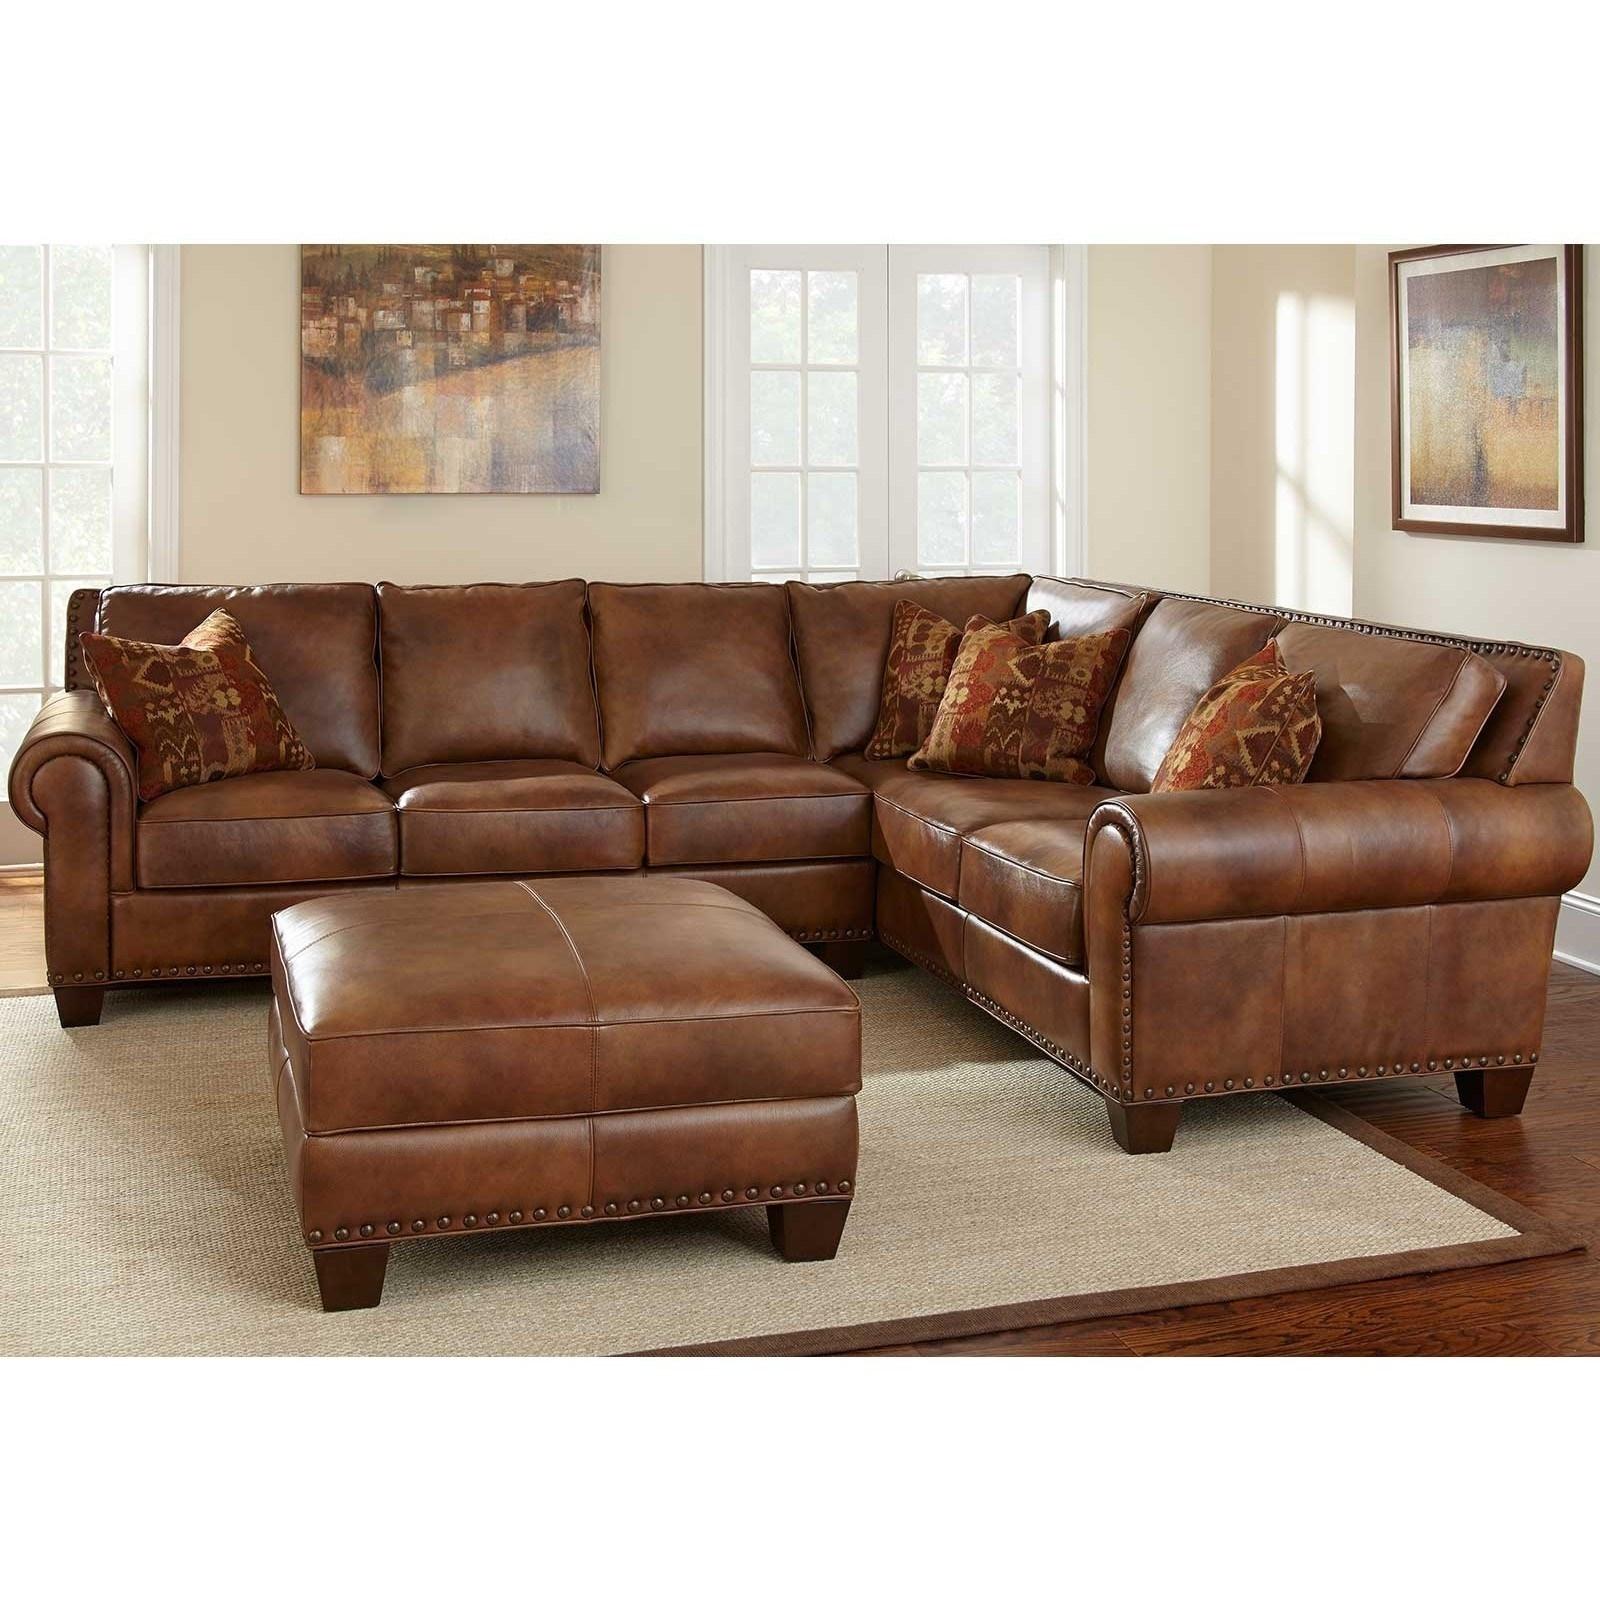 Sectional Sofa Sale Kijiji